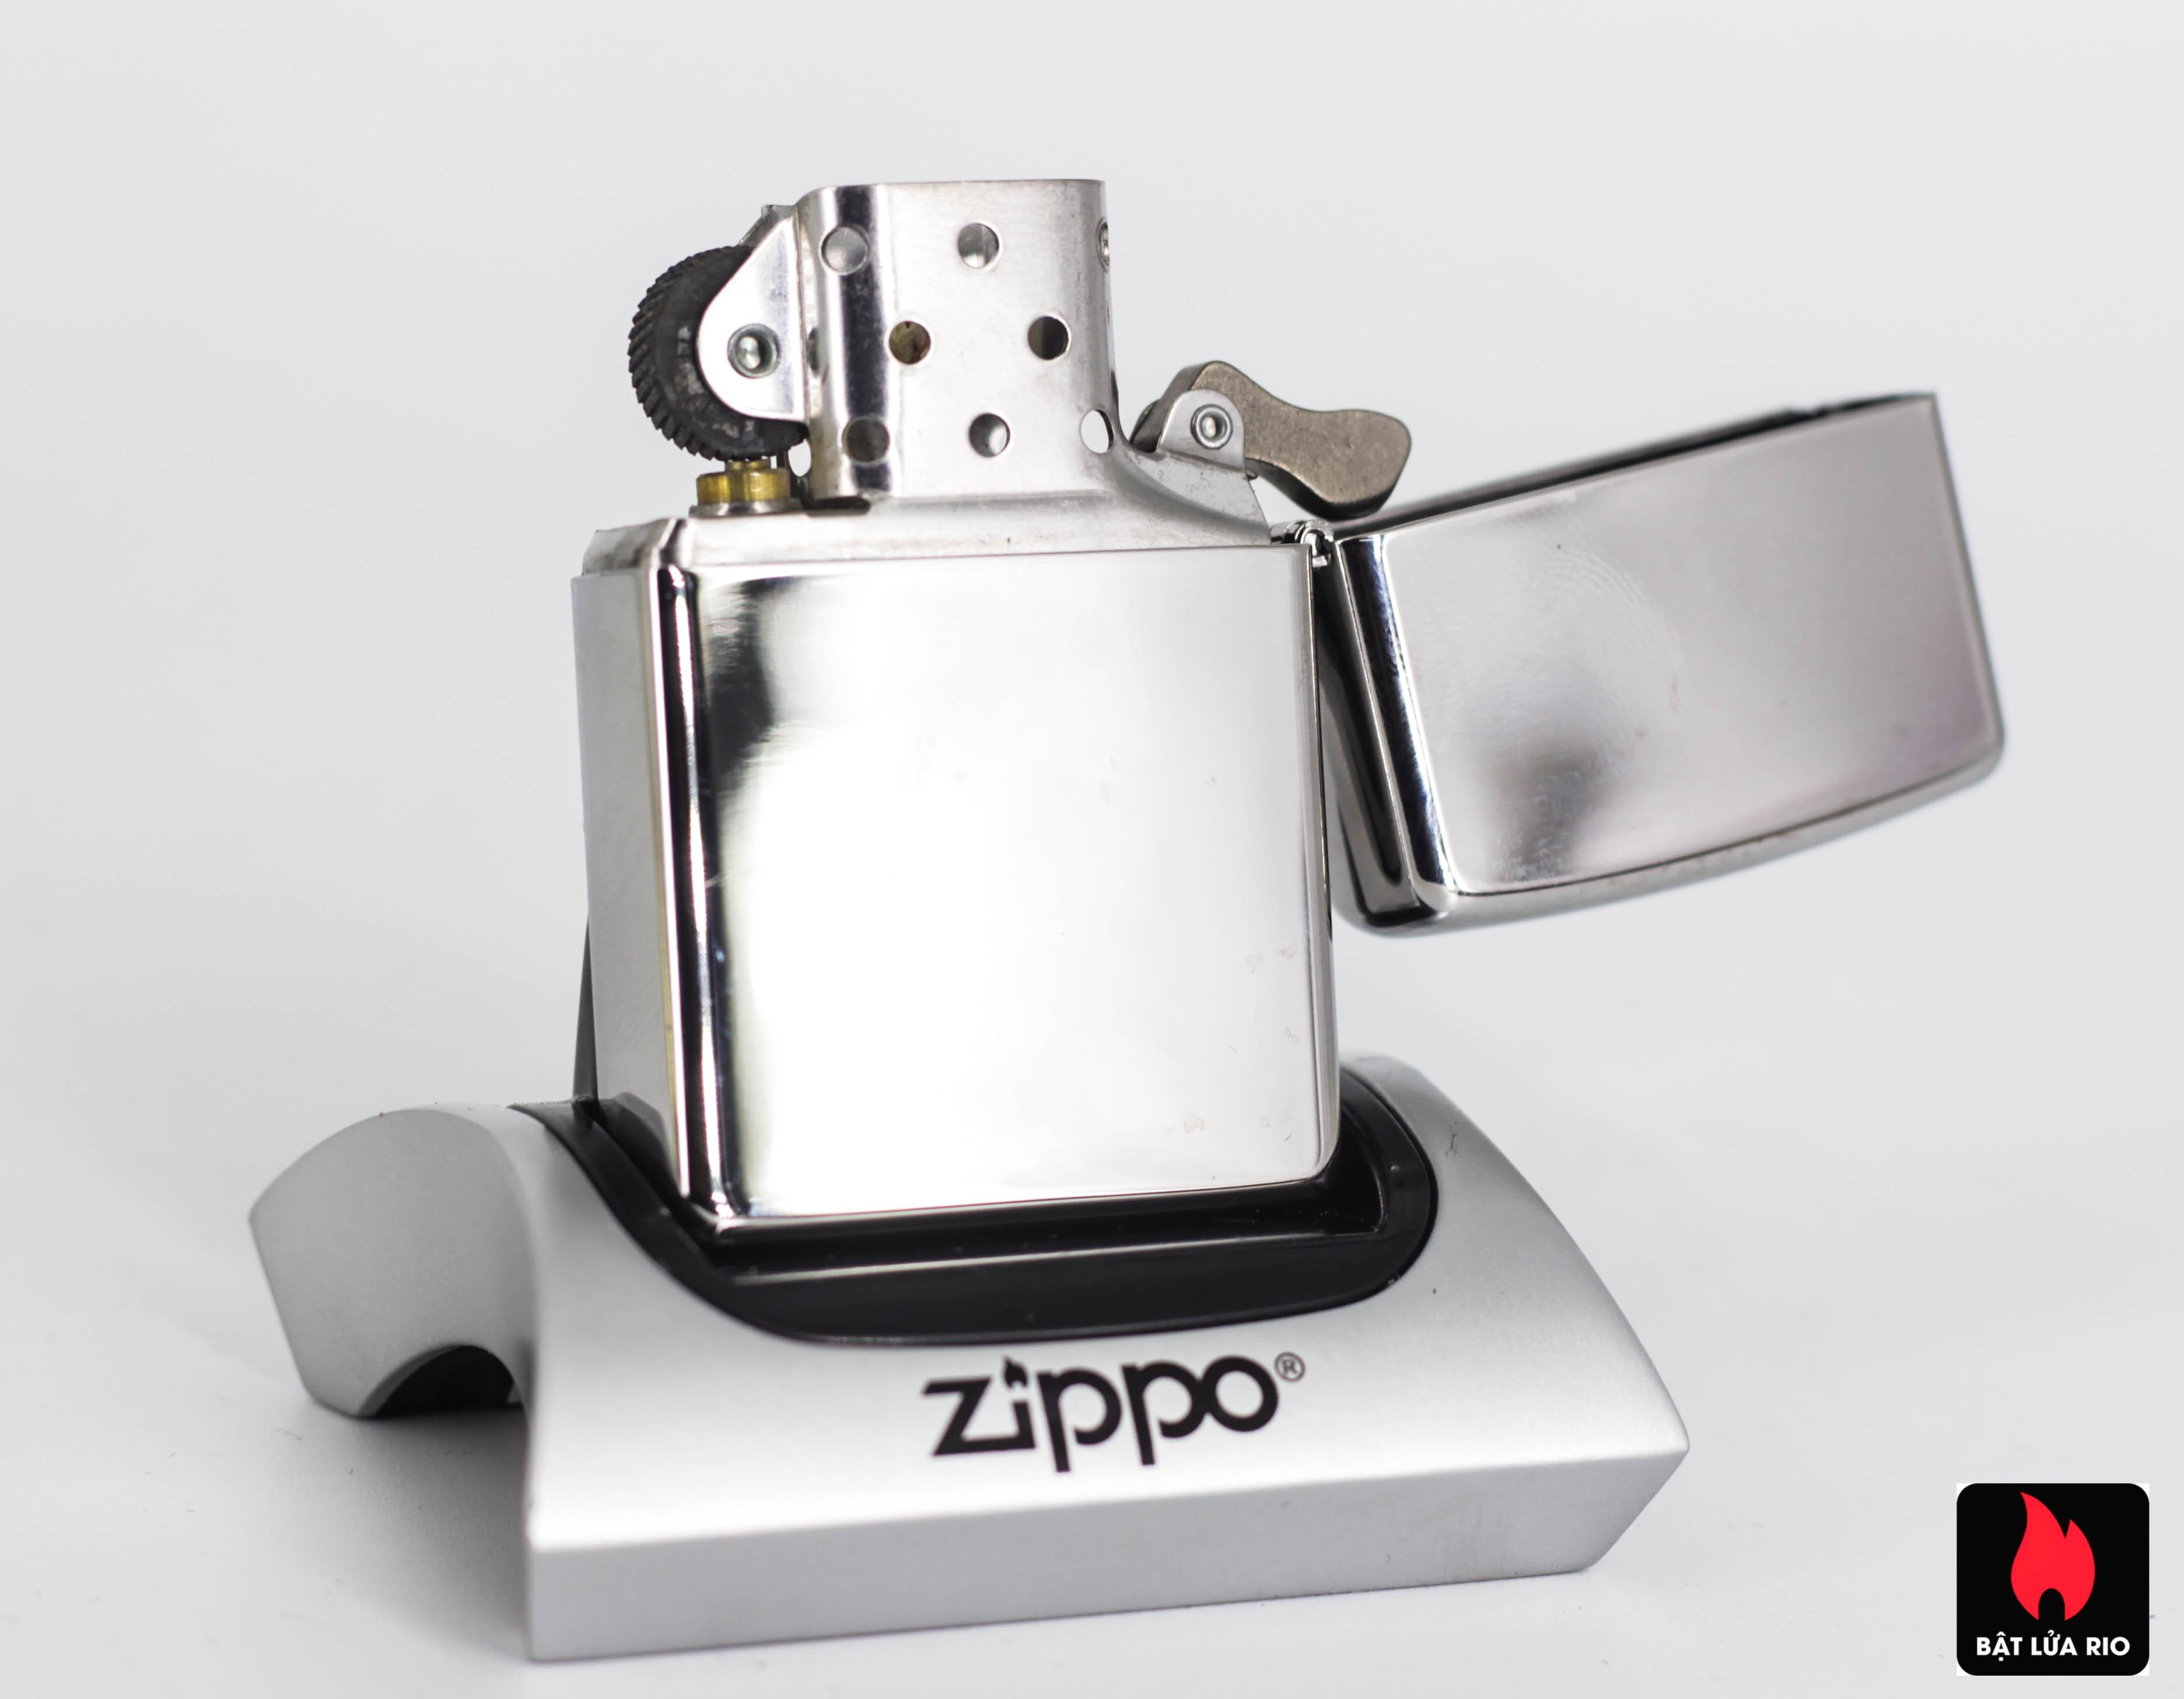 Zippo 2008 - Zippo Jim Beam Emblem High Polish Chrome 4